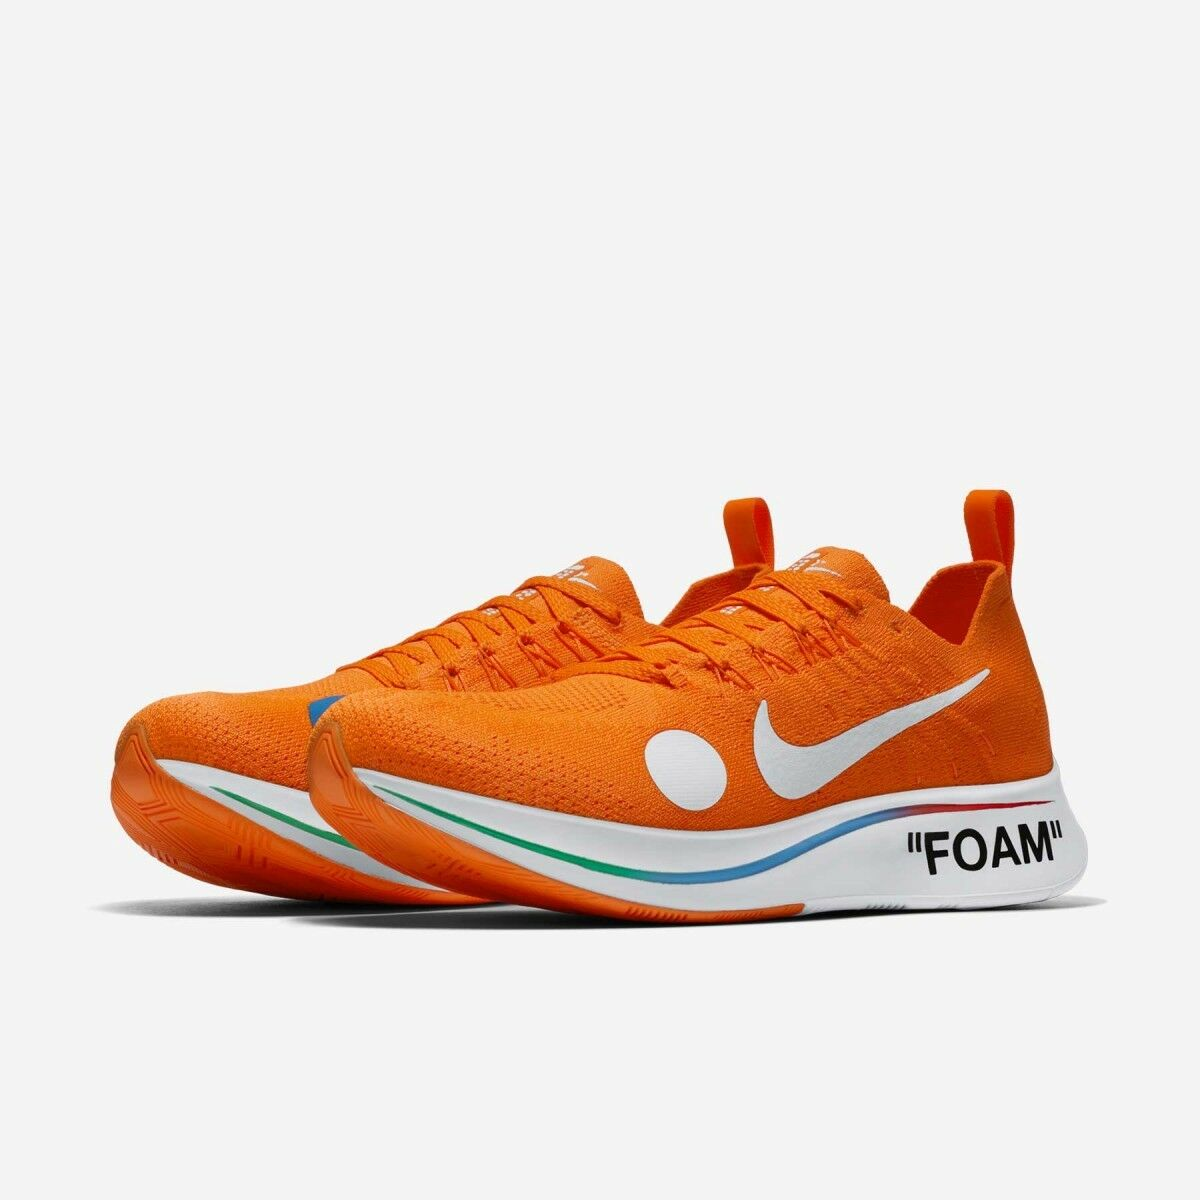 Nike x Off blanc Zoom Fly Mercurial Flyknit Orange7 US 8